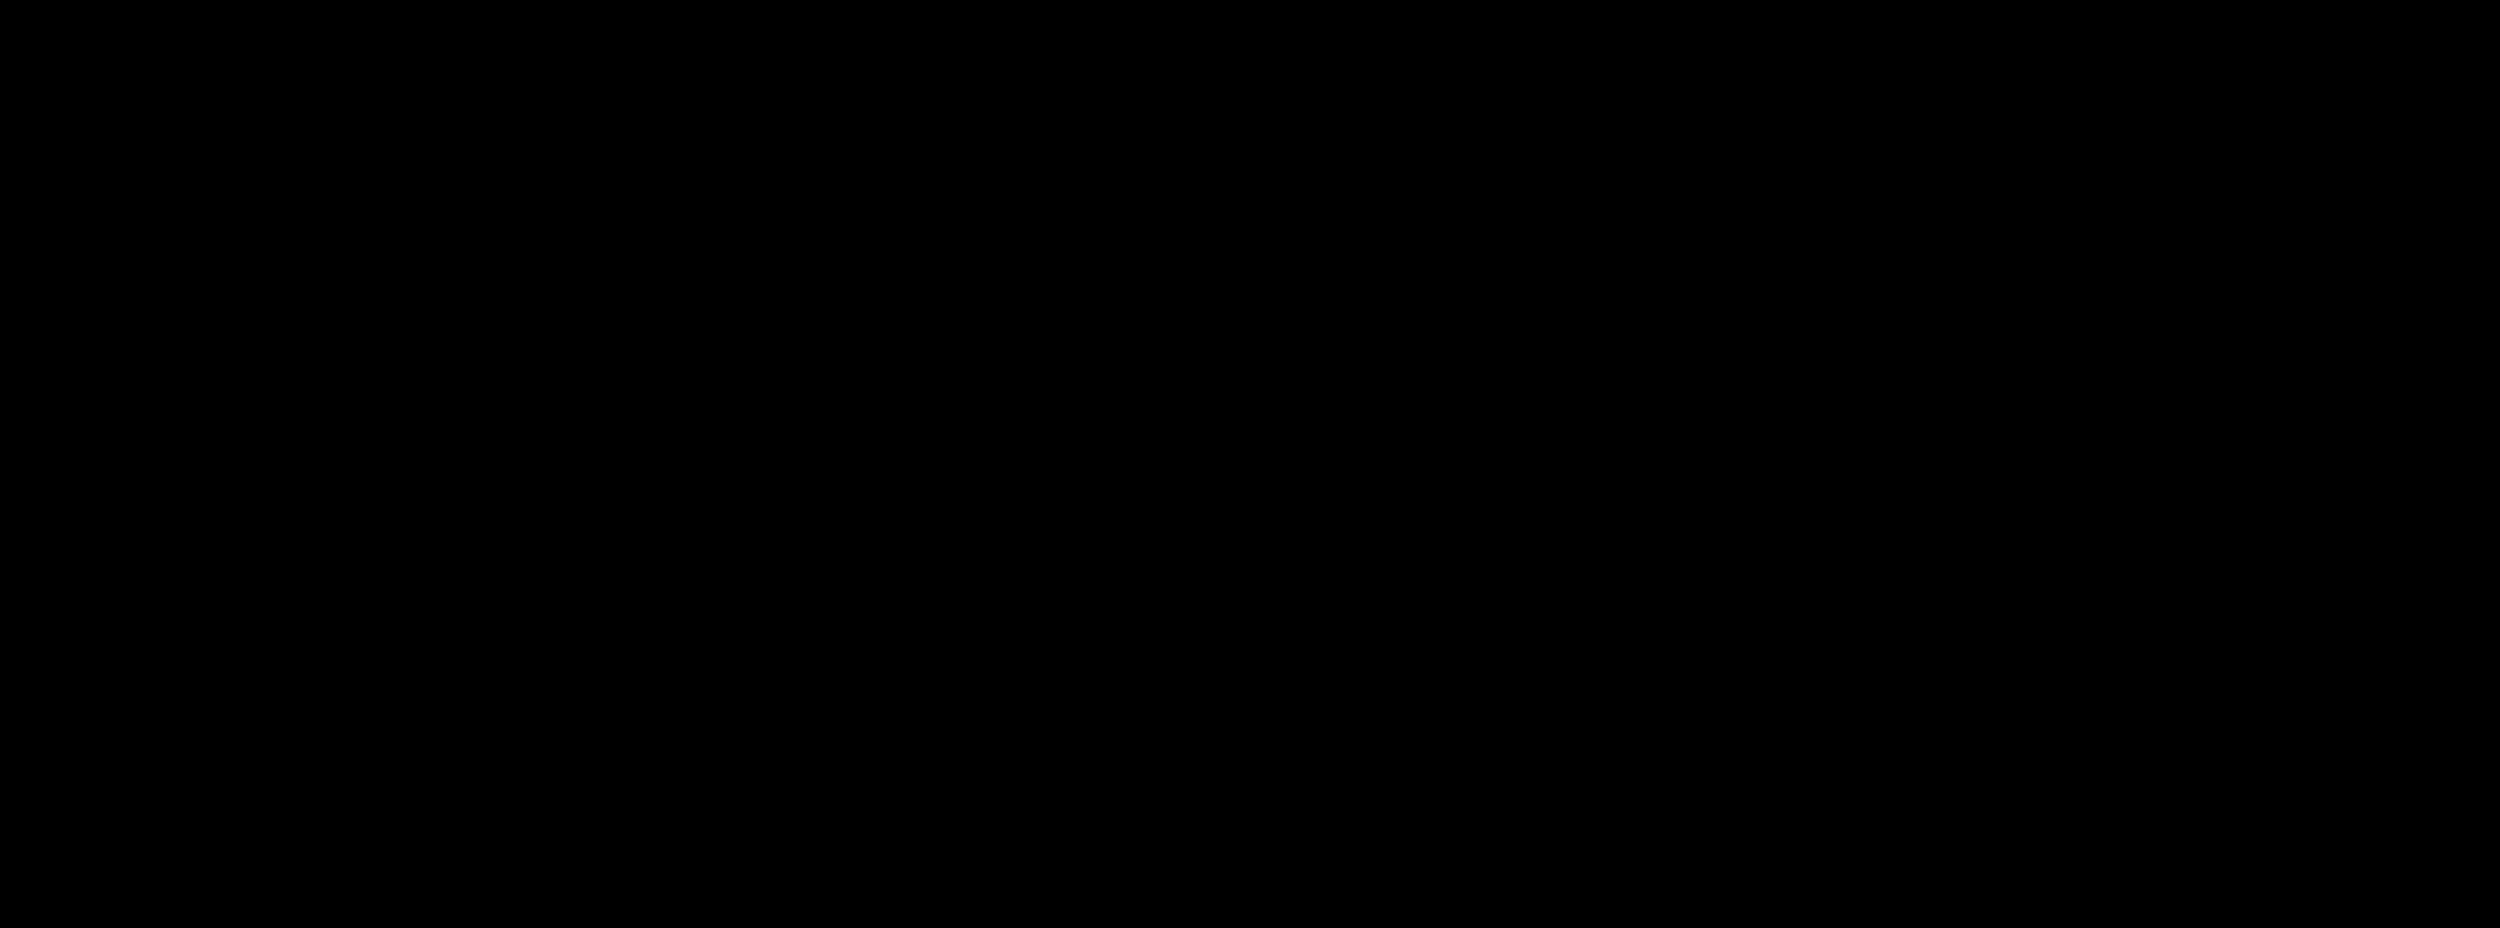 IDpak Logo Design III.png